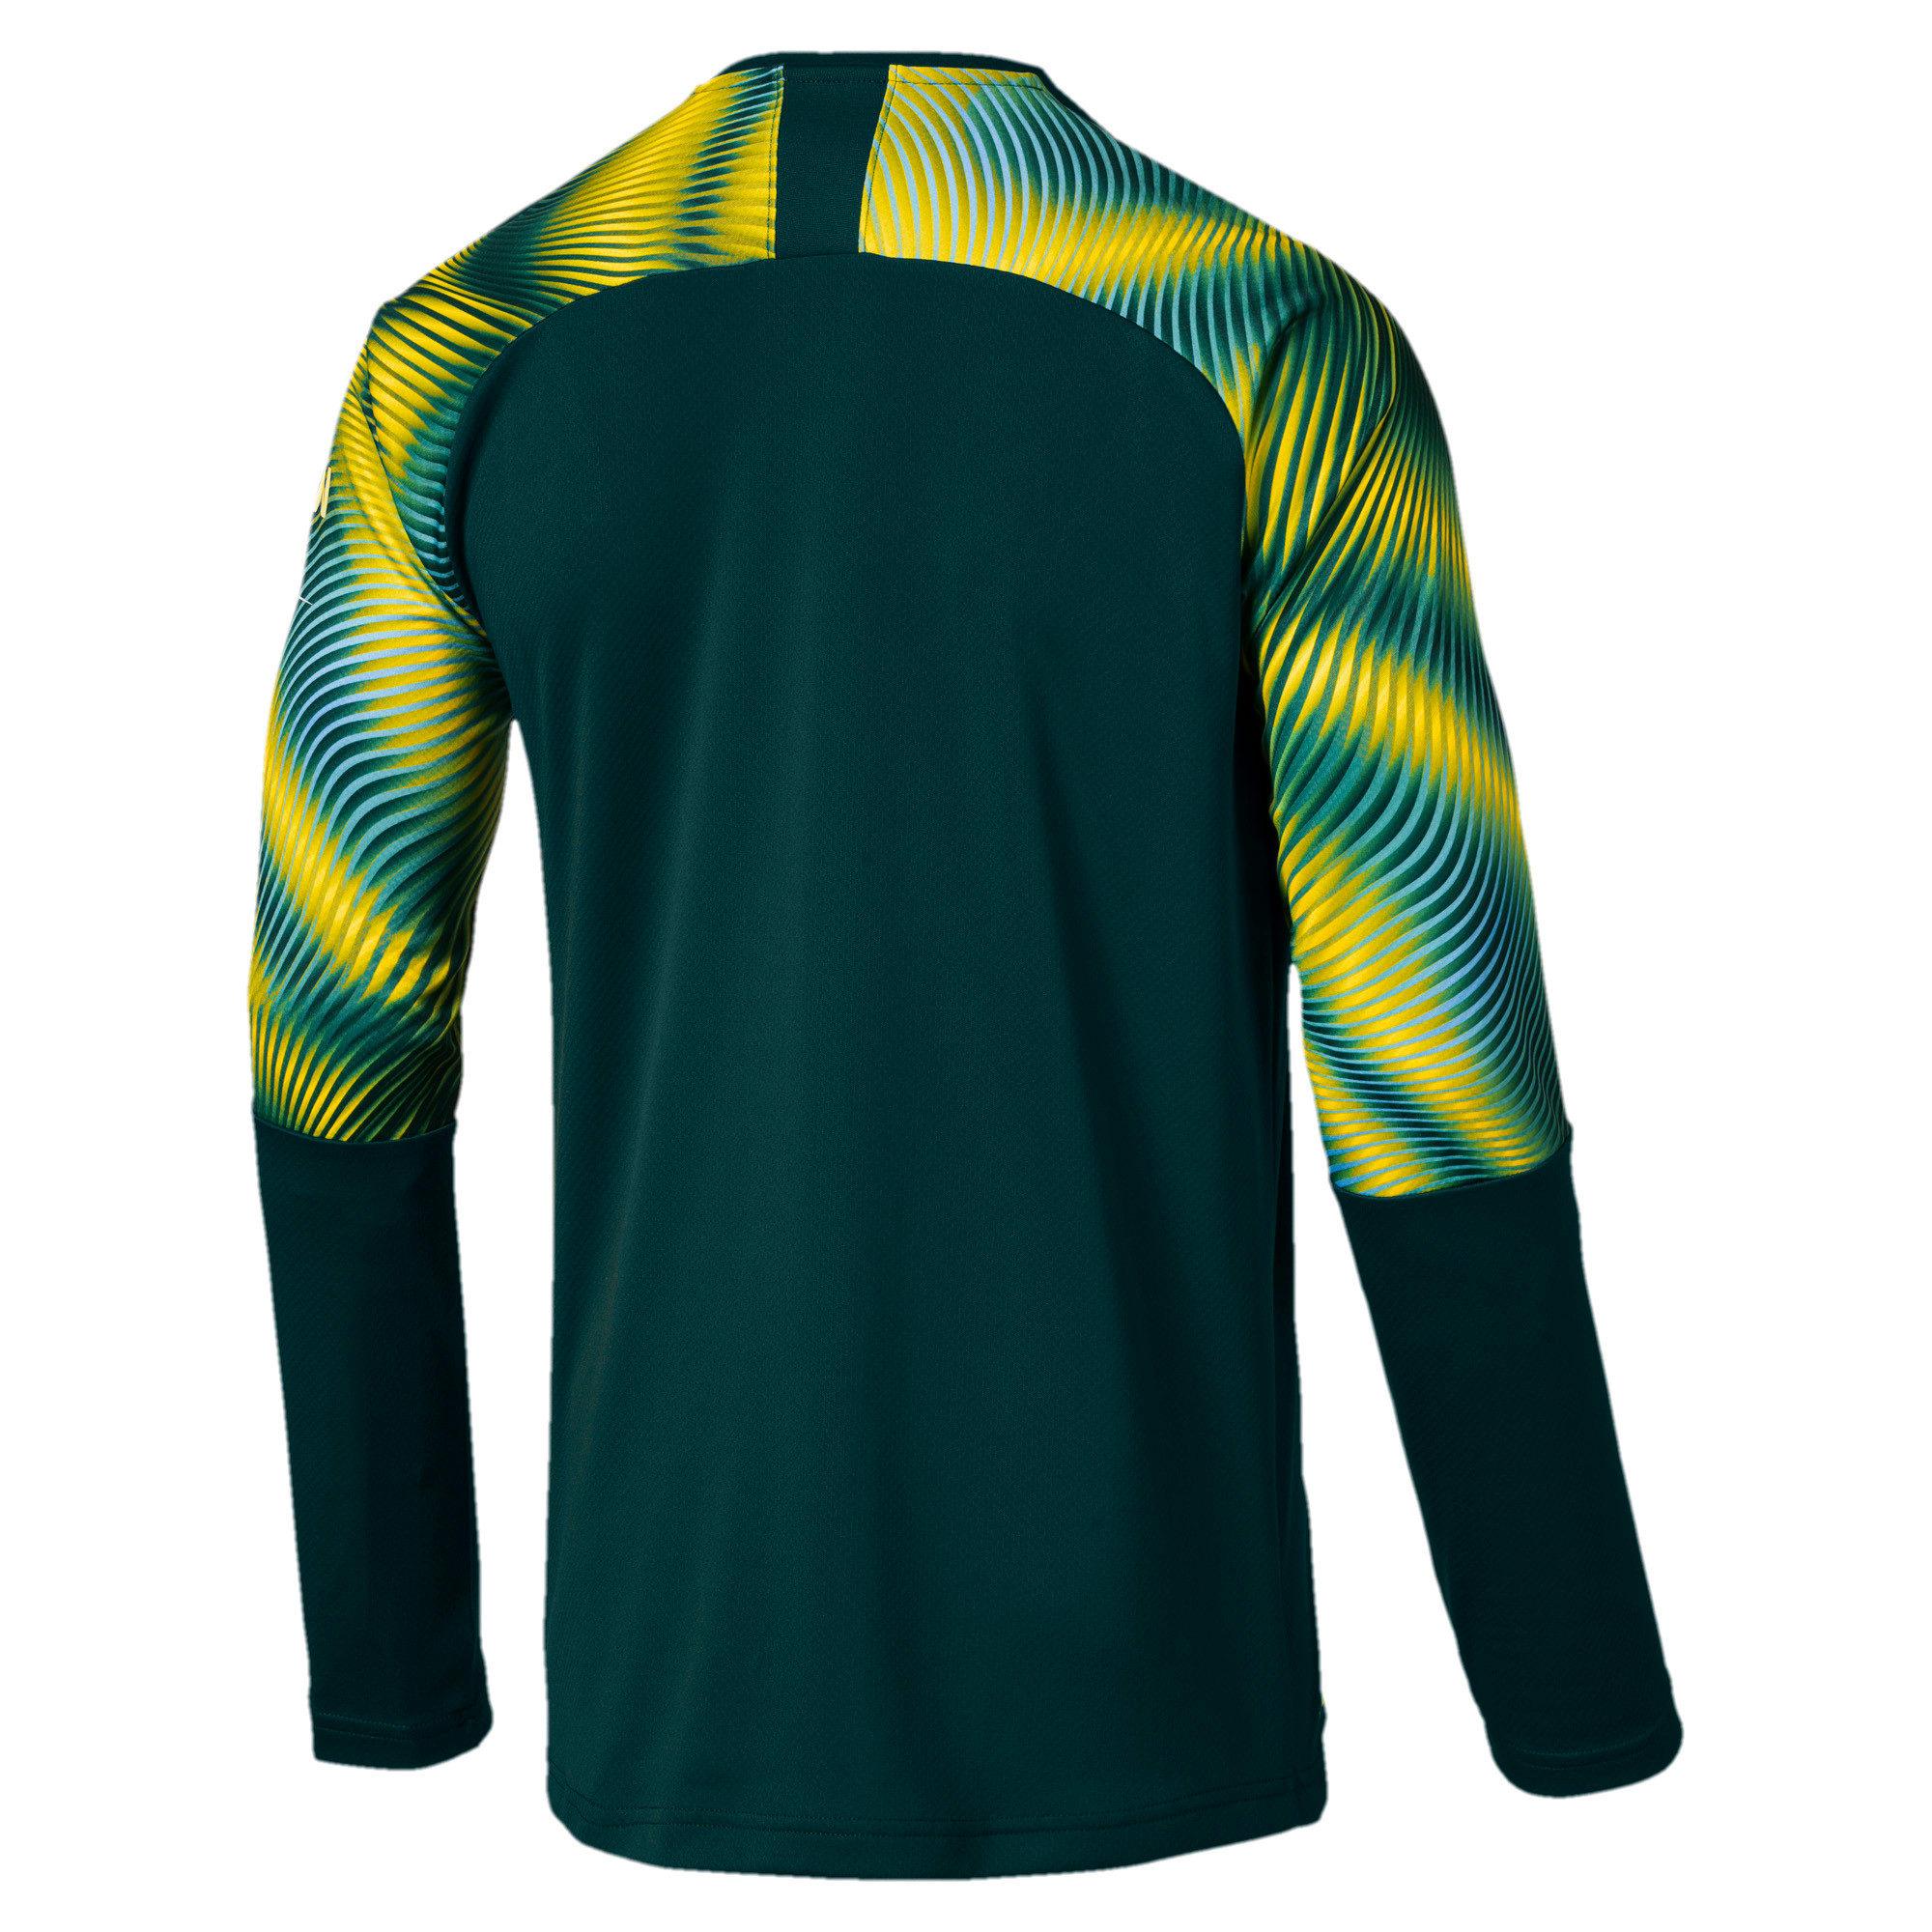 Thumbnail 2 of Man City Men's Replica Goalkeeper Jersey, Ponderosa Pine-Cyber Yellow, medium